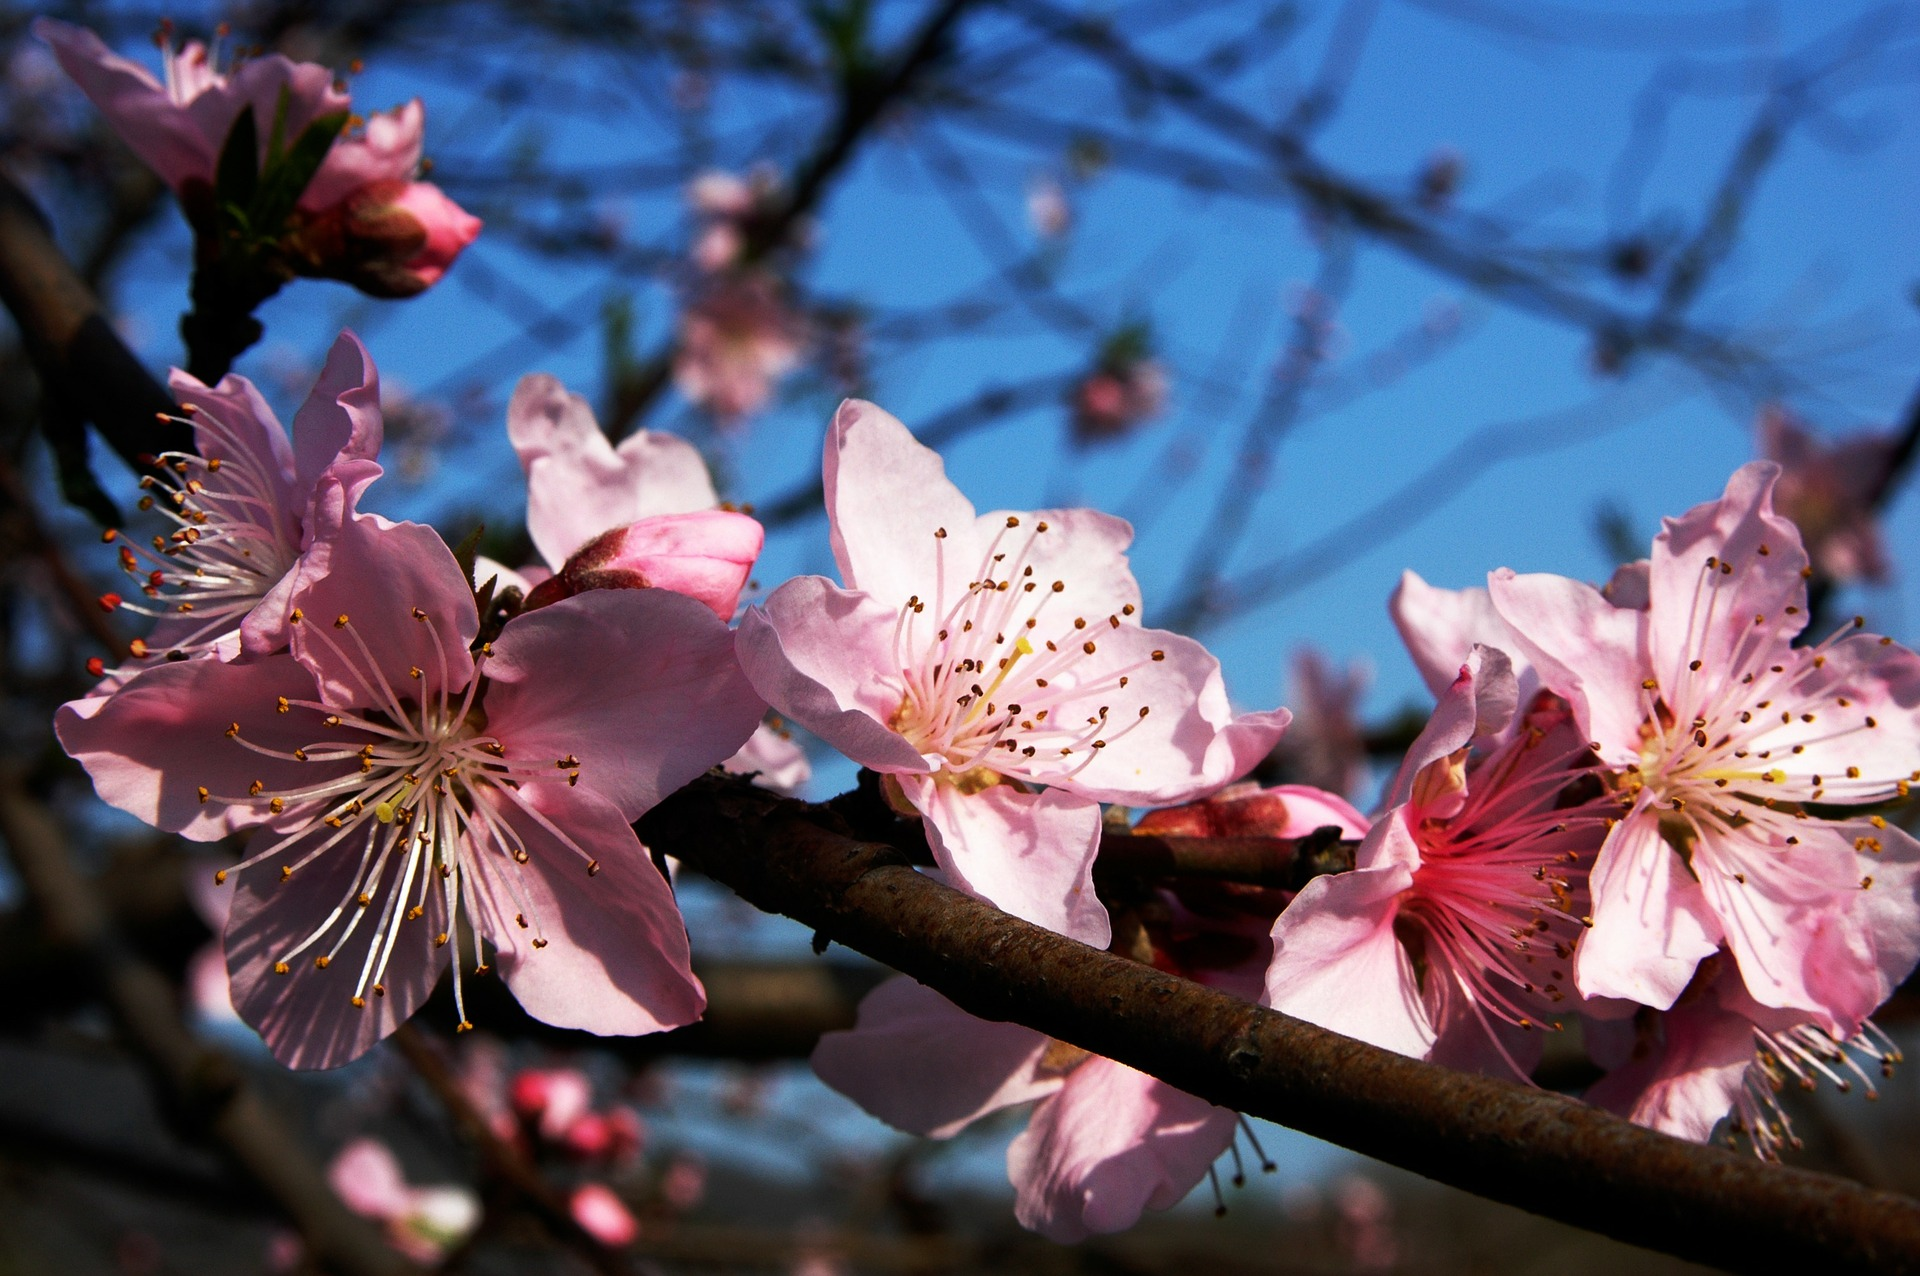 plum-blossom-283115_1920.jpg